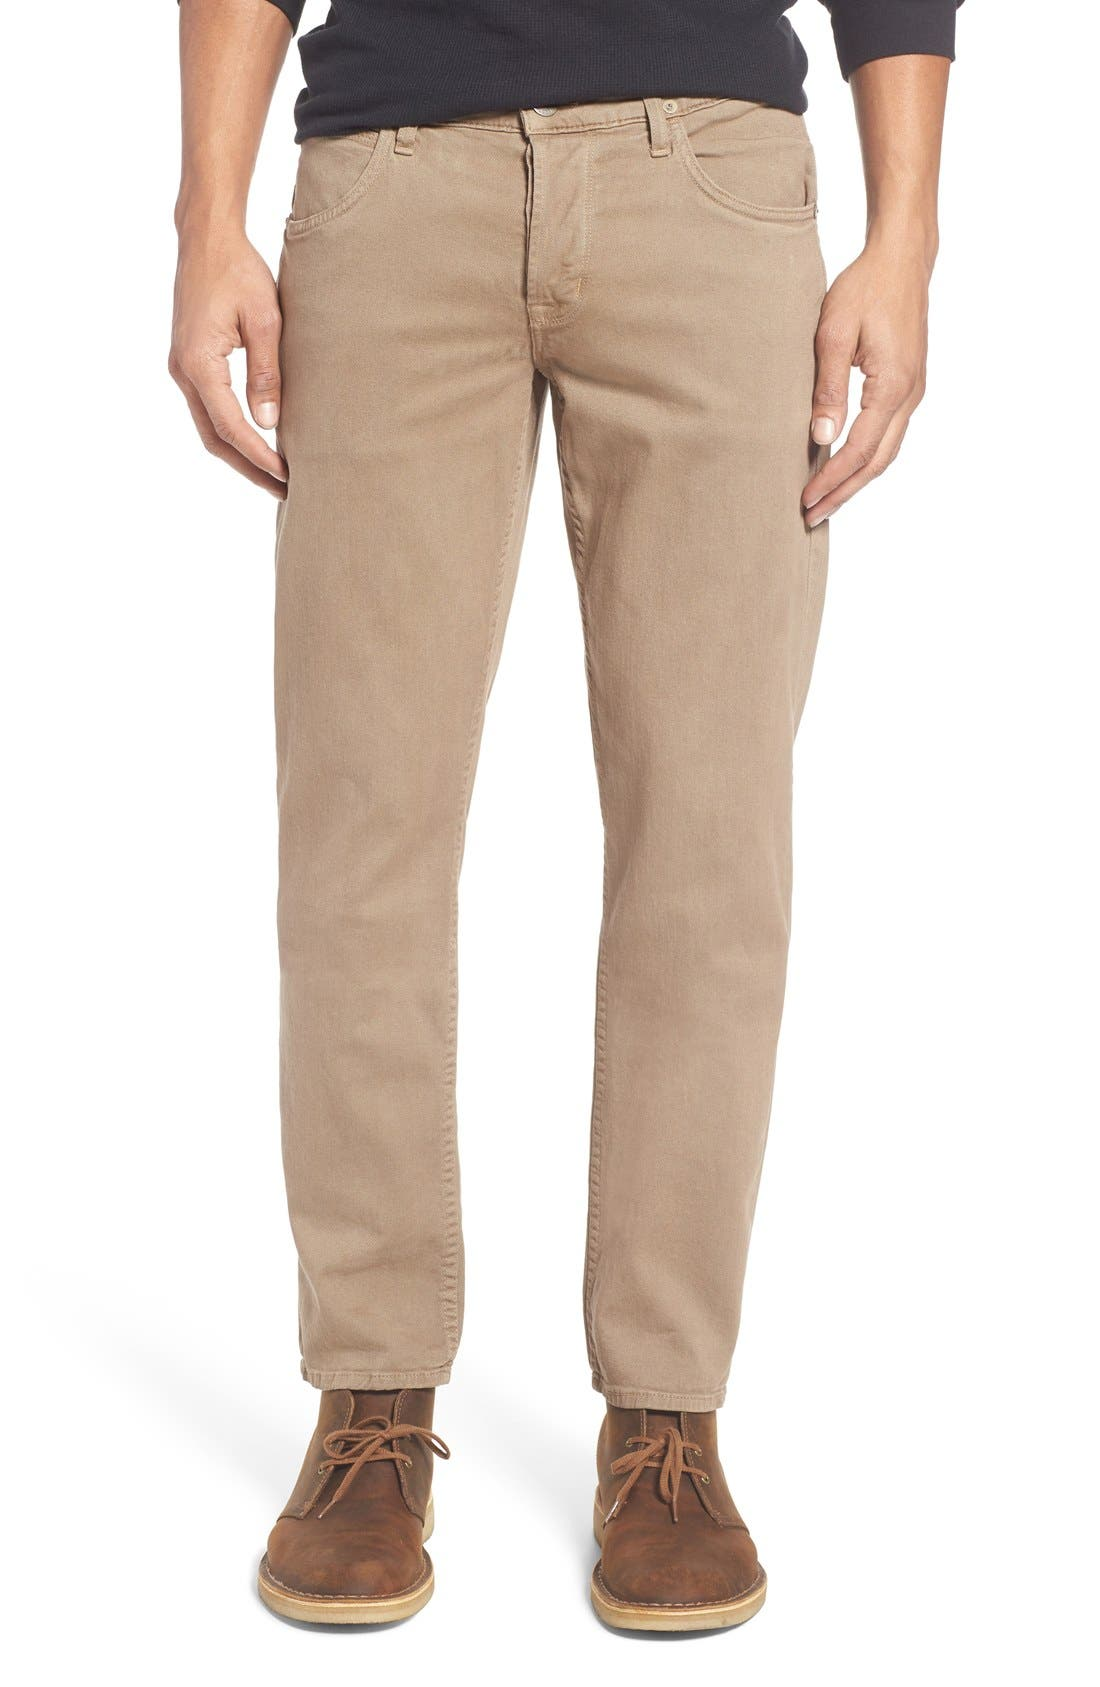 Alternate Image 1 Selected - Hudson Jeans Blake Slim Fit Jeans (Quicksand Khaki)